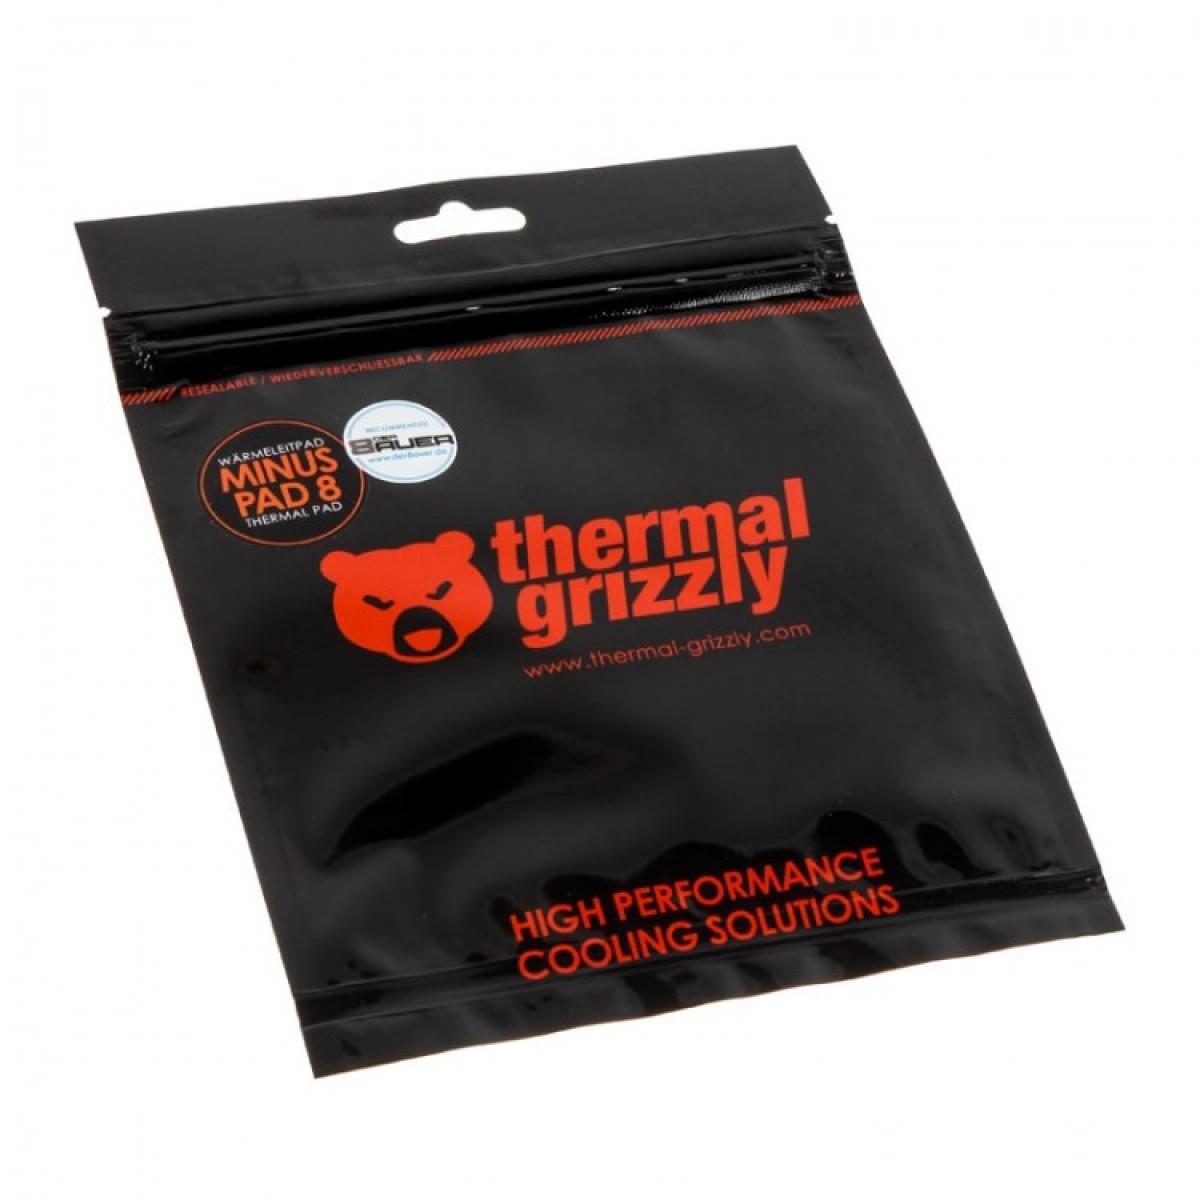 Pad Térmico Thermal Grizzly Minus Pad 8, 20mm x 120mm, TG-MP8-120-20-15-1R